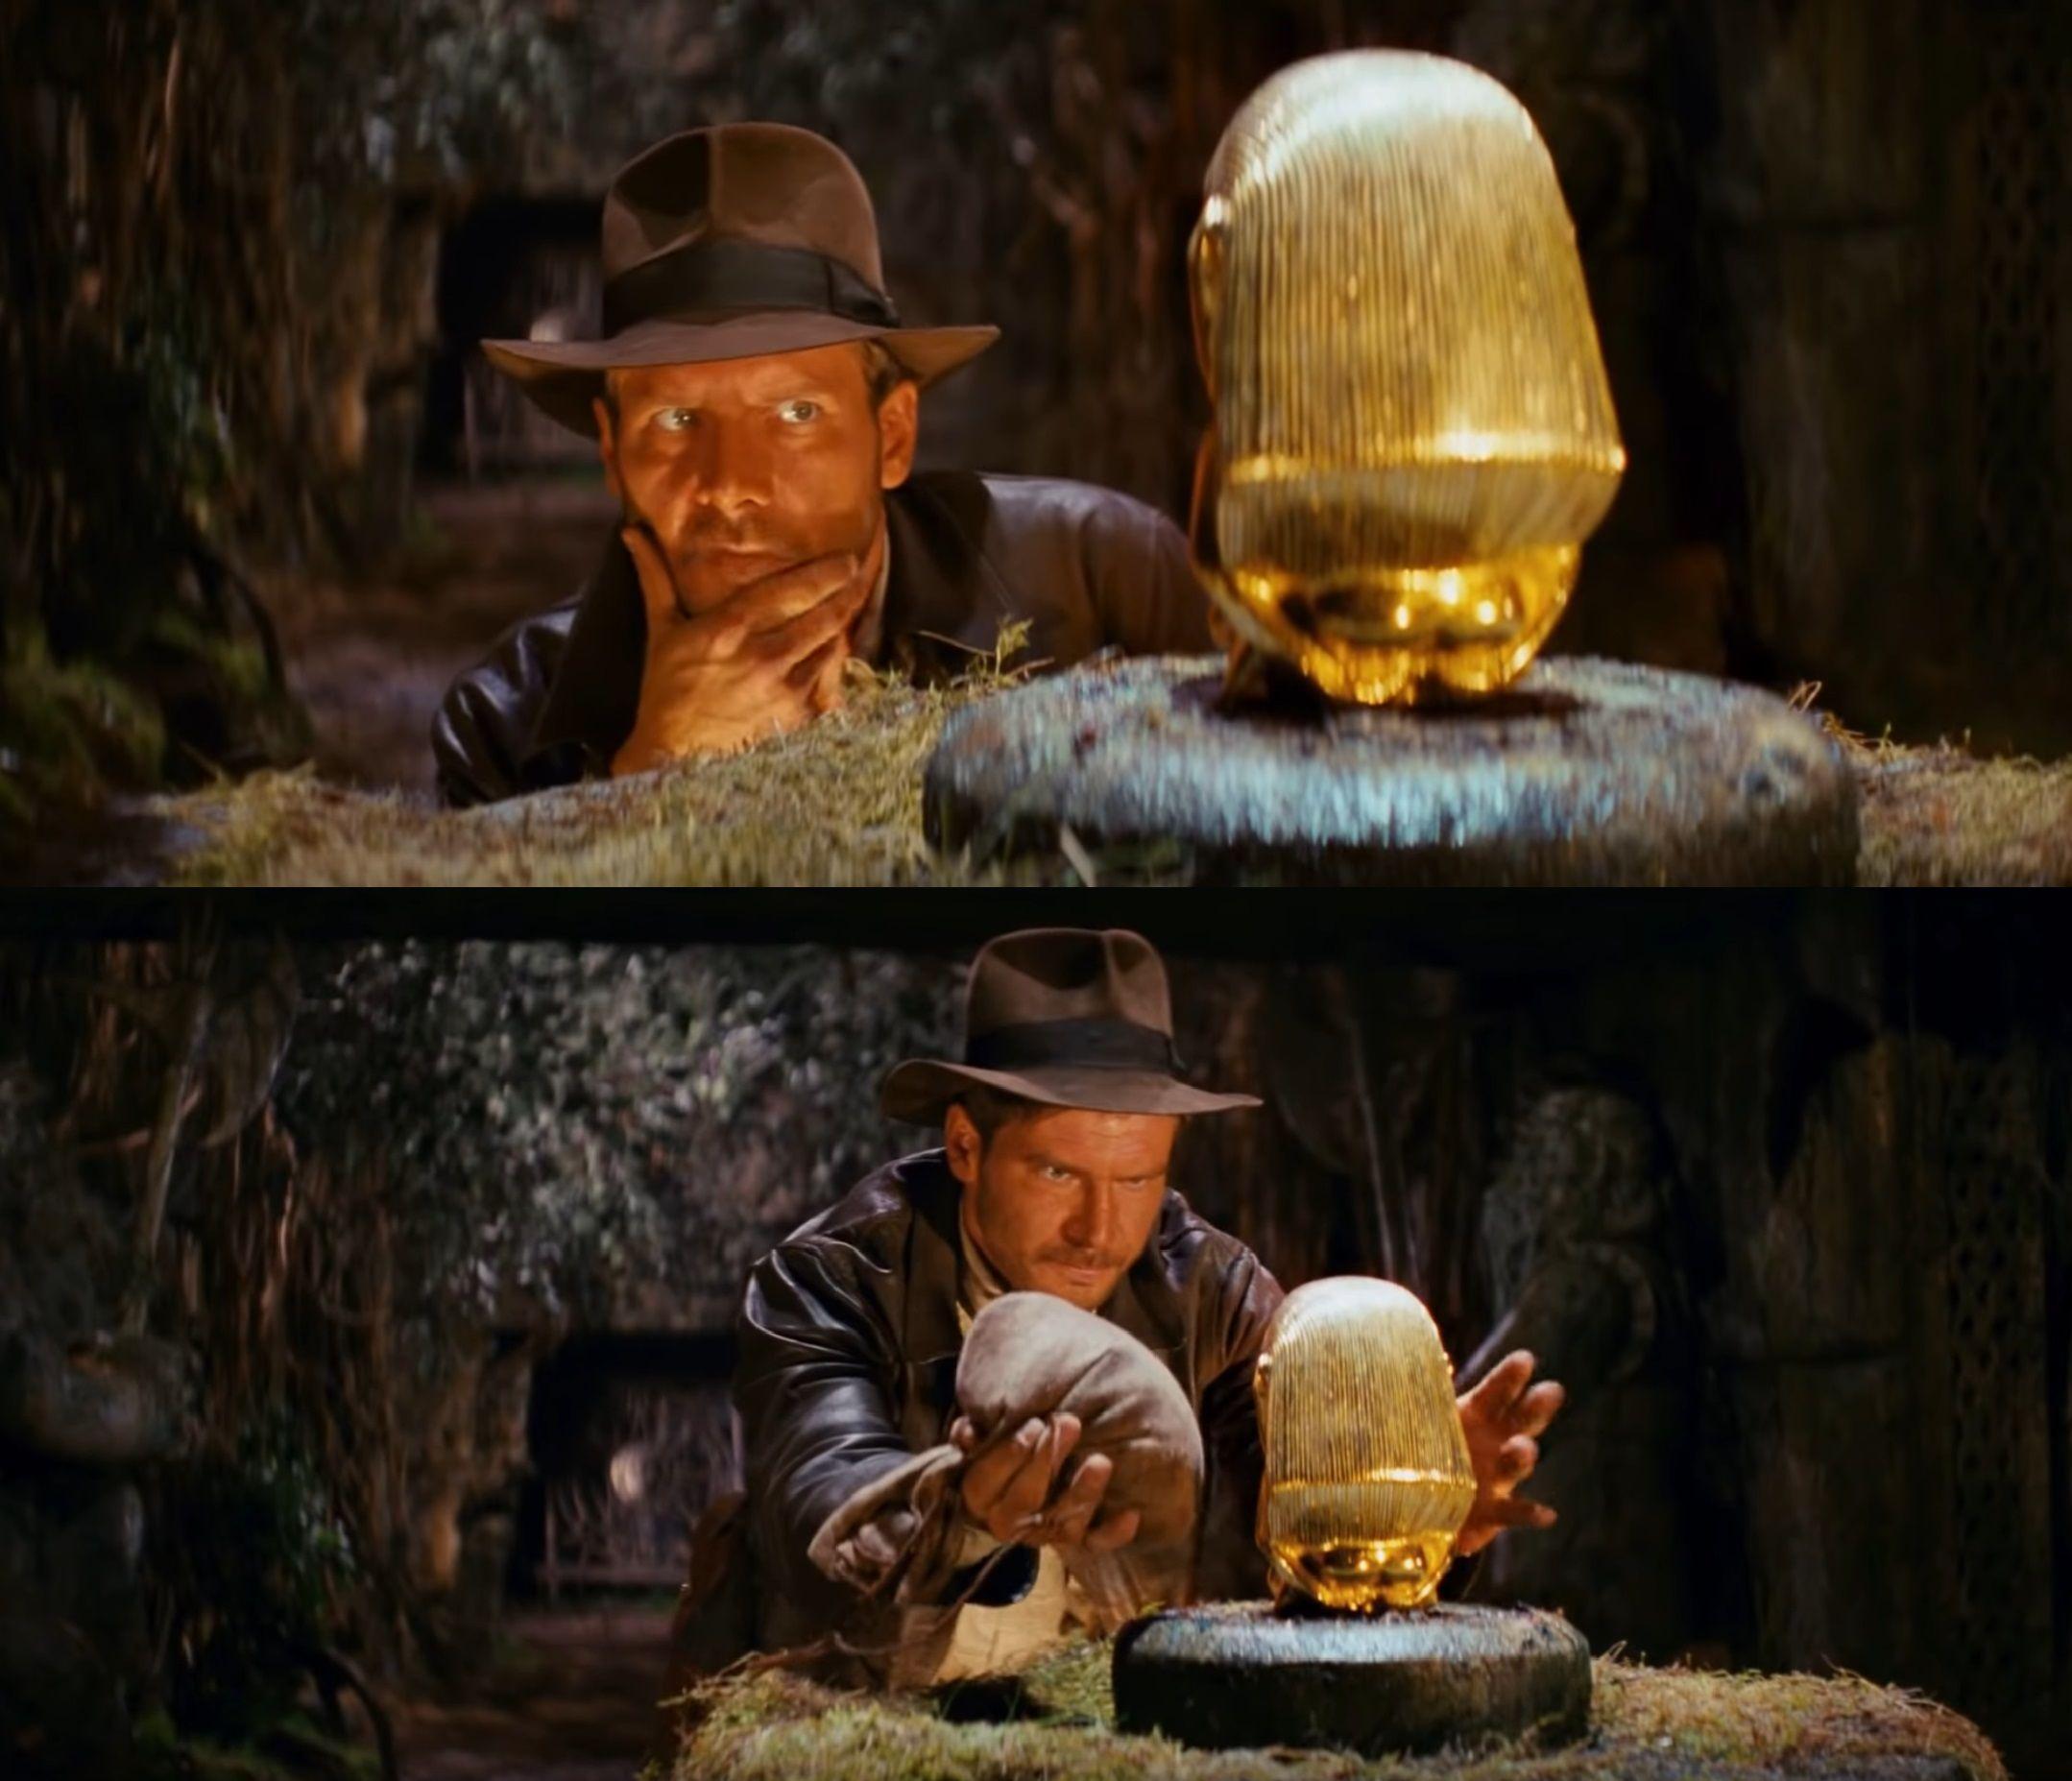 Indiana Jones Swap Idol Meme Meme Template and Creator